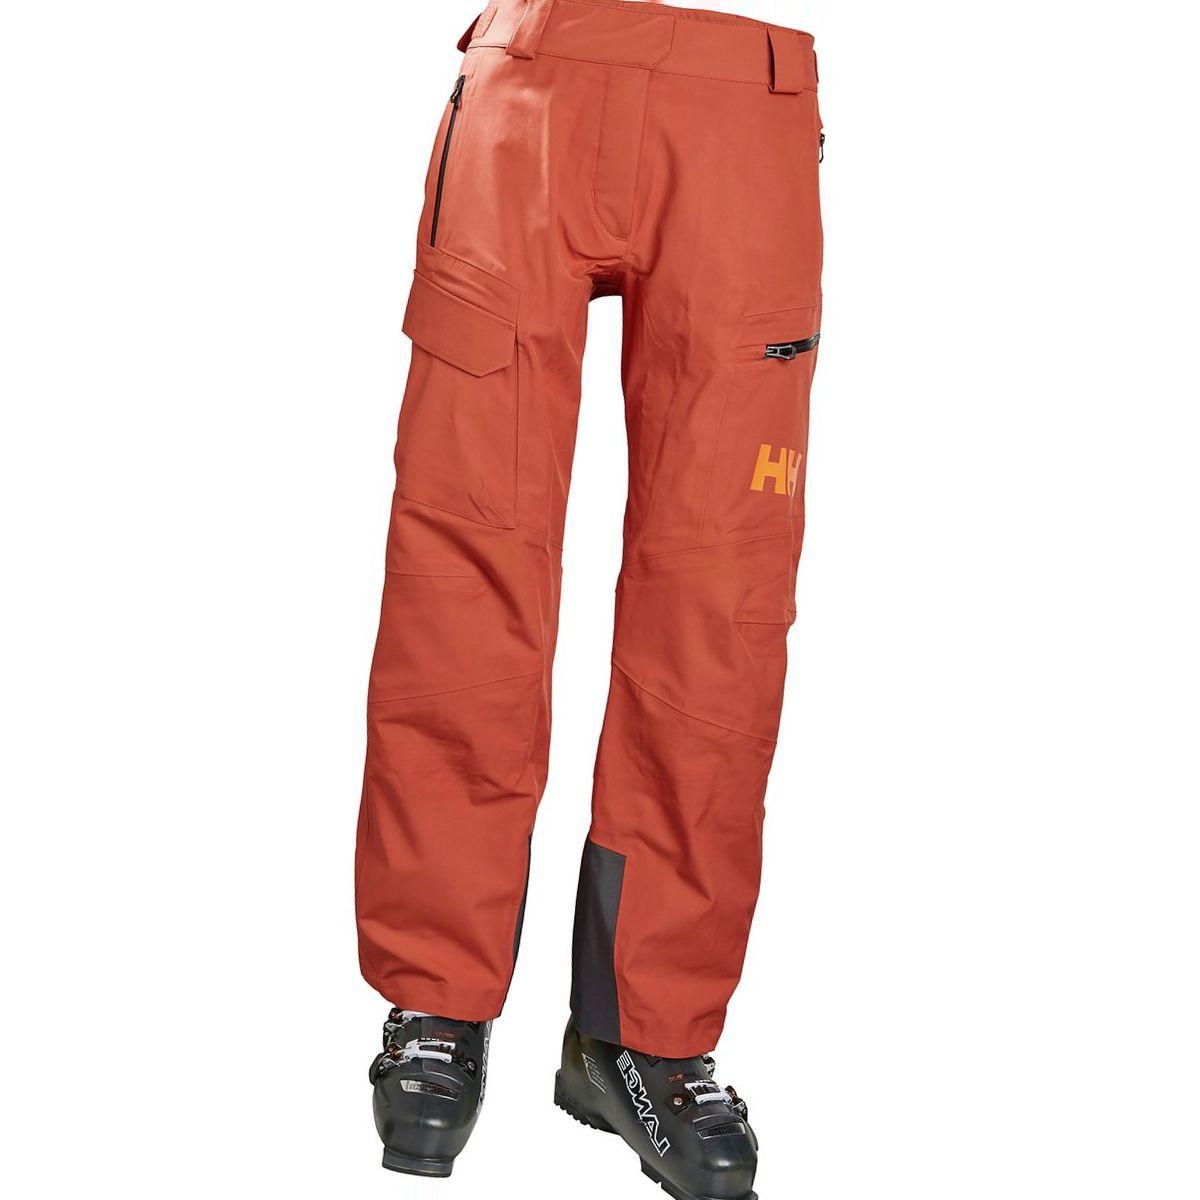 Helly Hansen Ridge Shell Pant - Men's